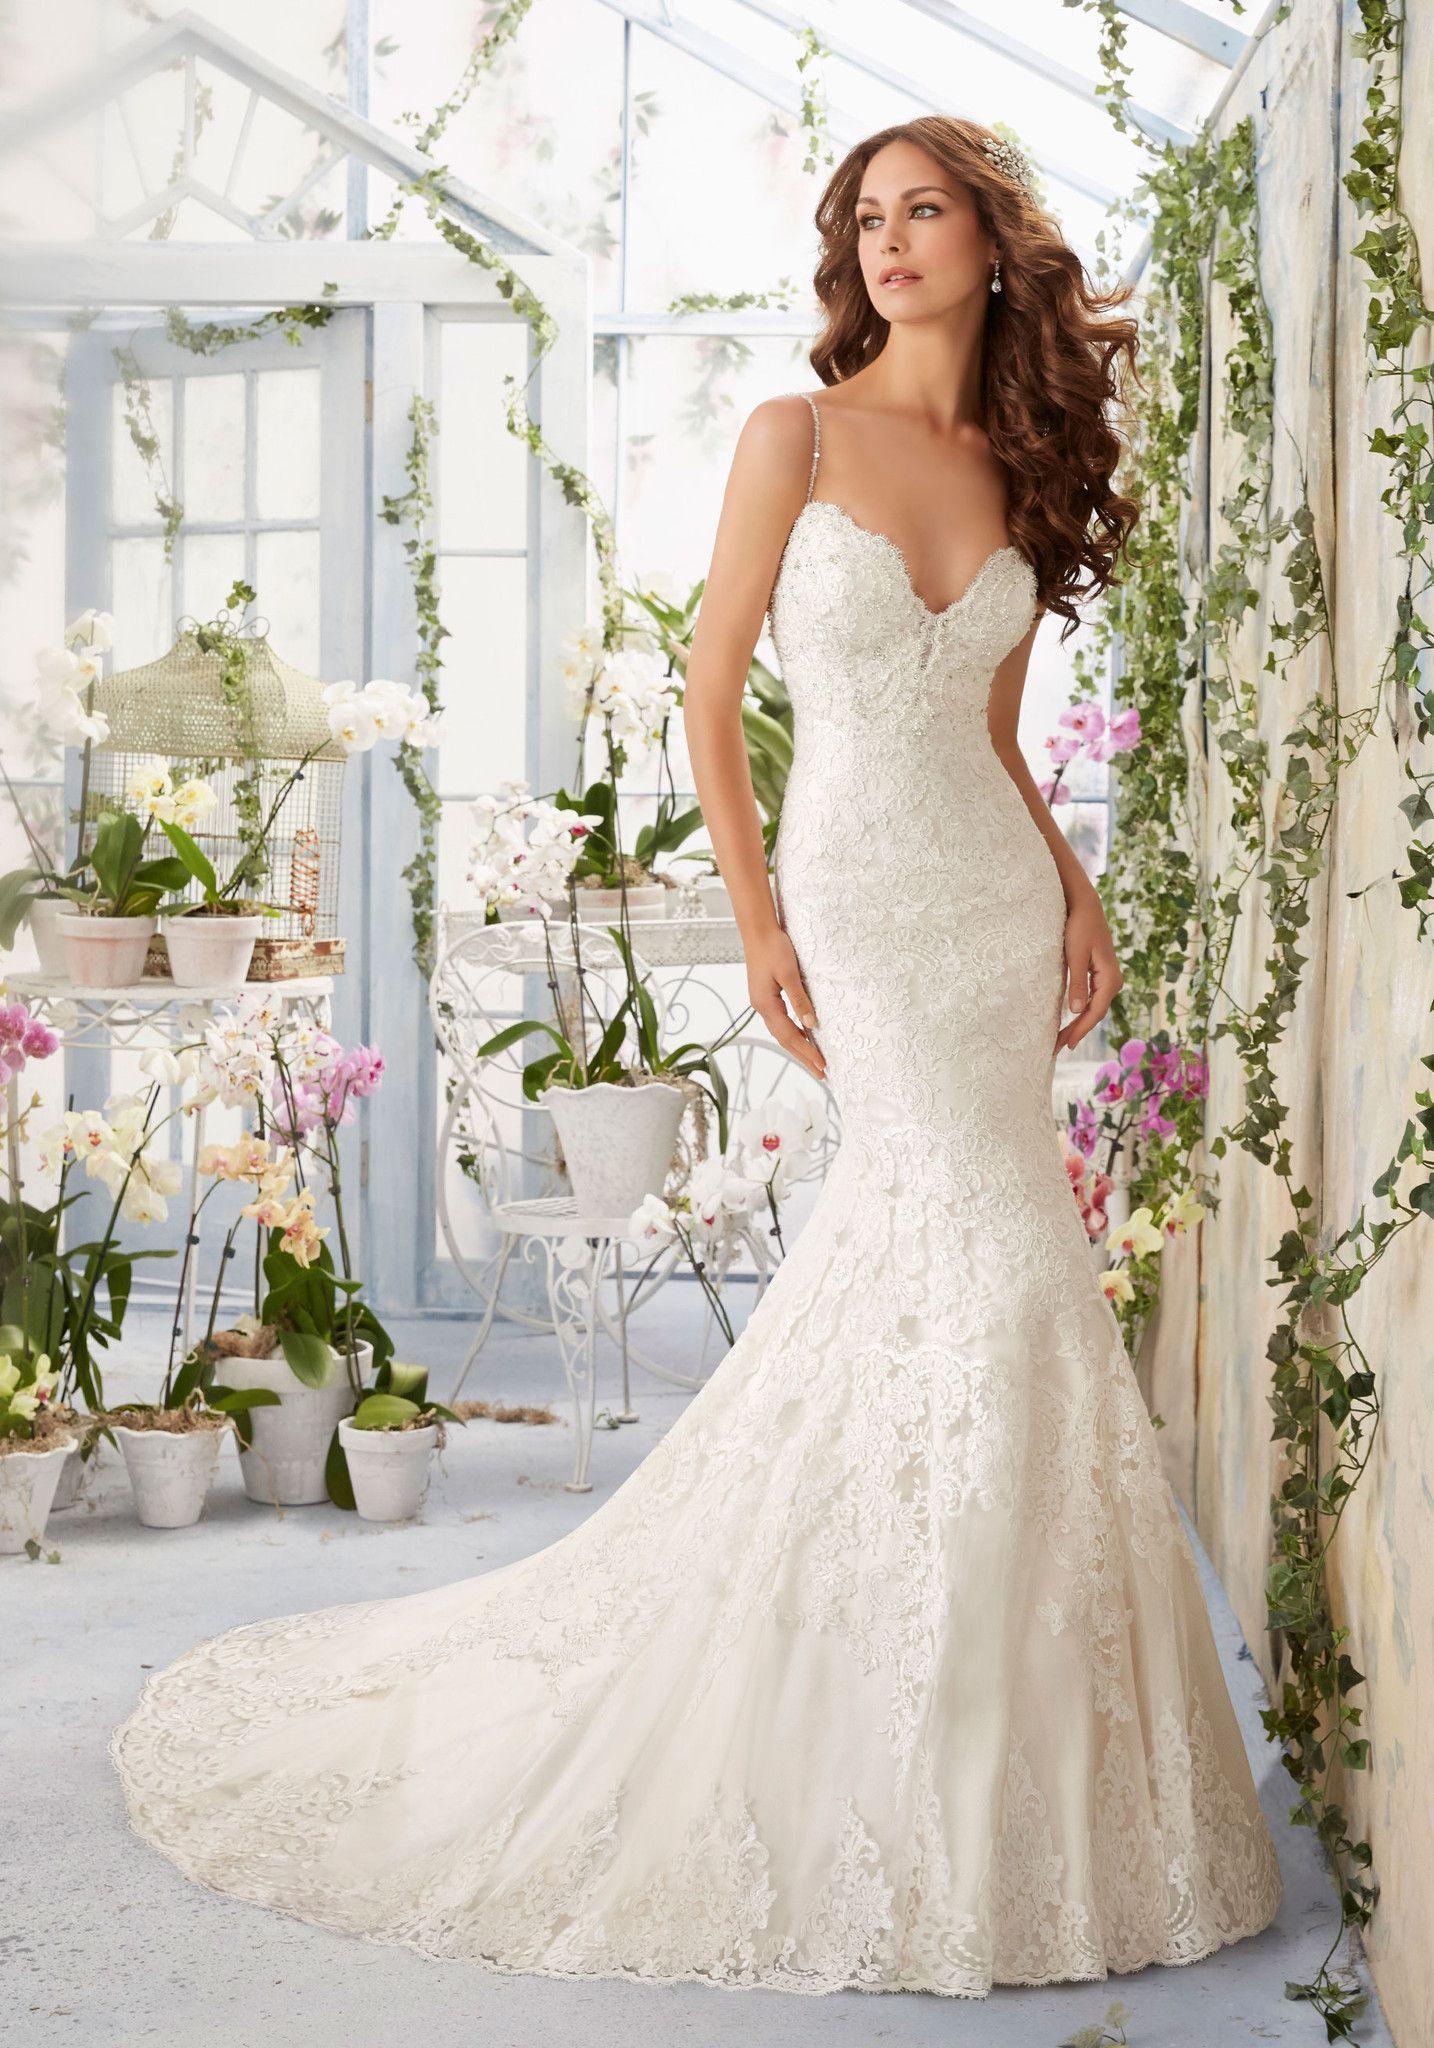 Size 8 wedding dress  Mori Lee  scalloped lace bridal dress Ivory Size   Mori lee